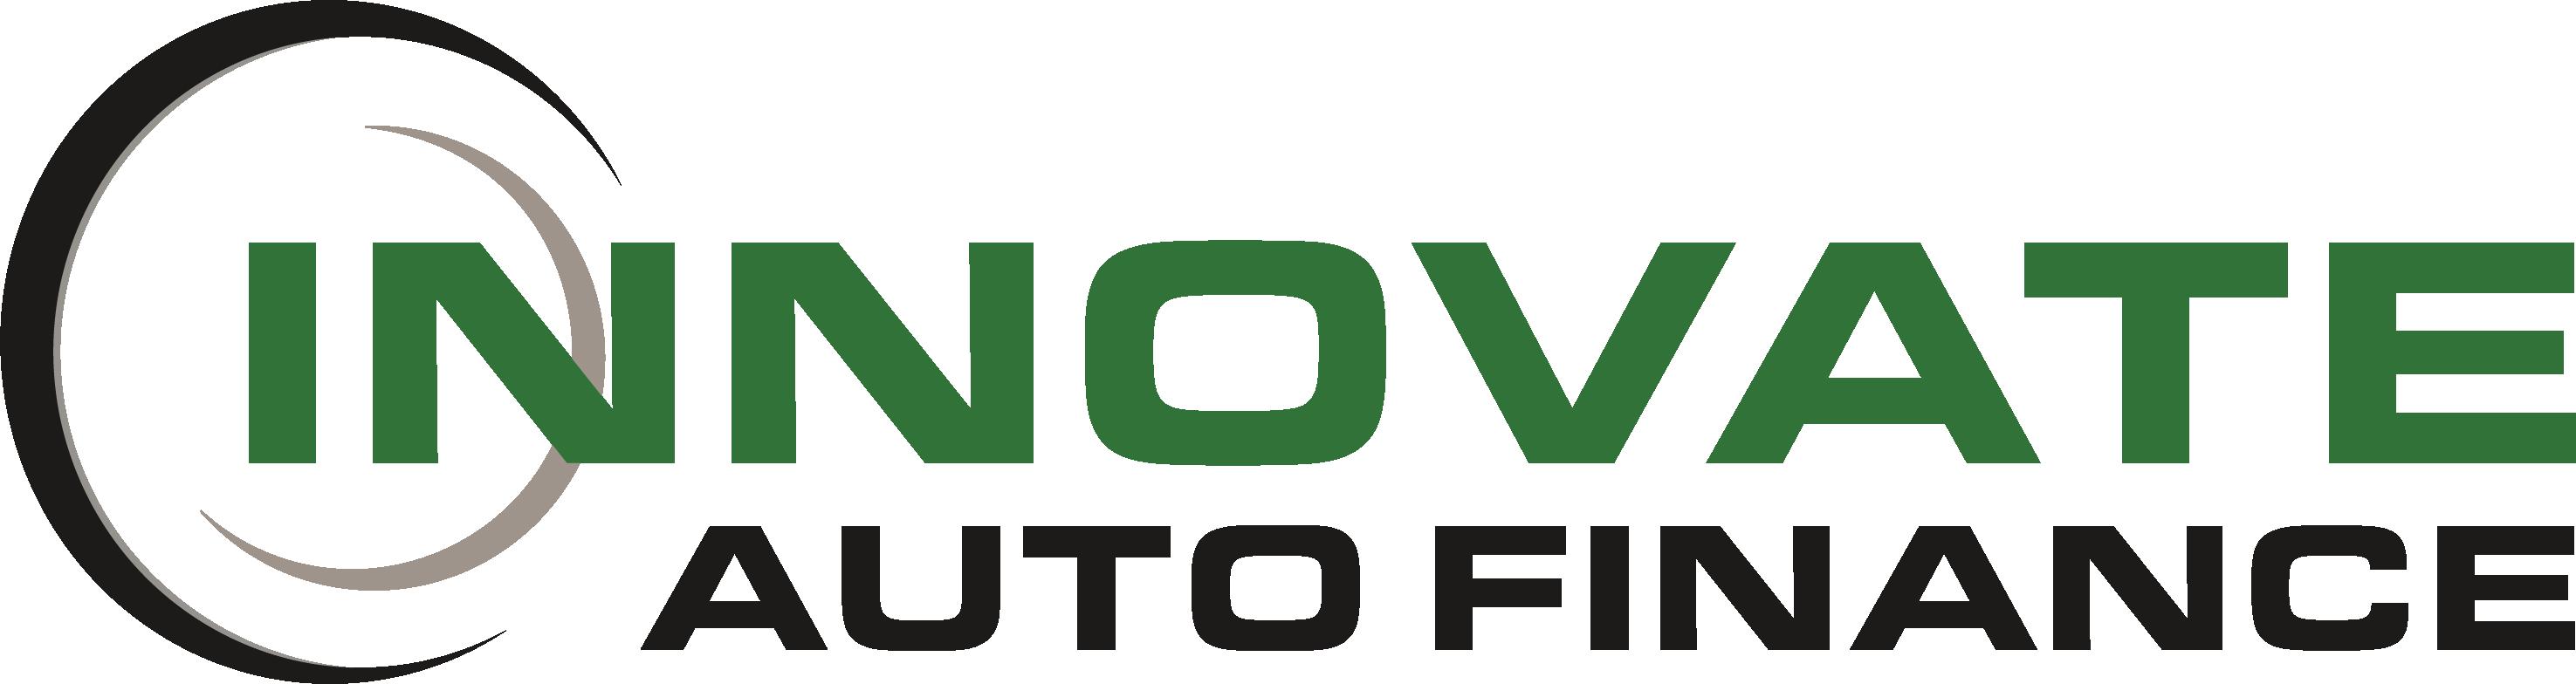 Innovate Auto Finace